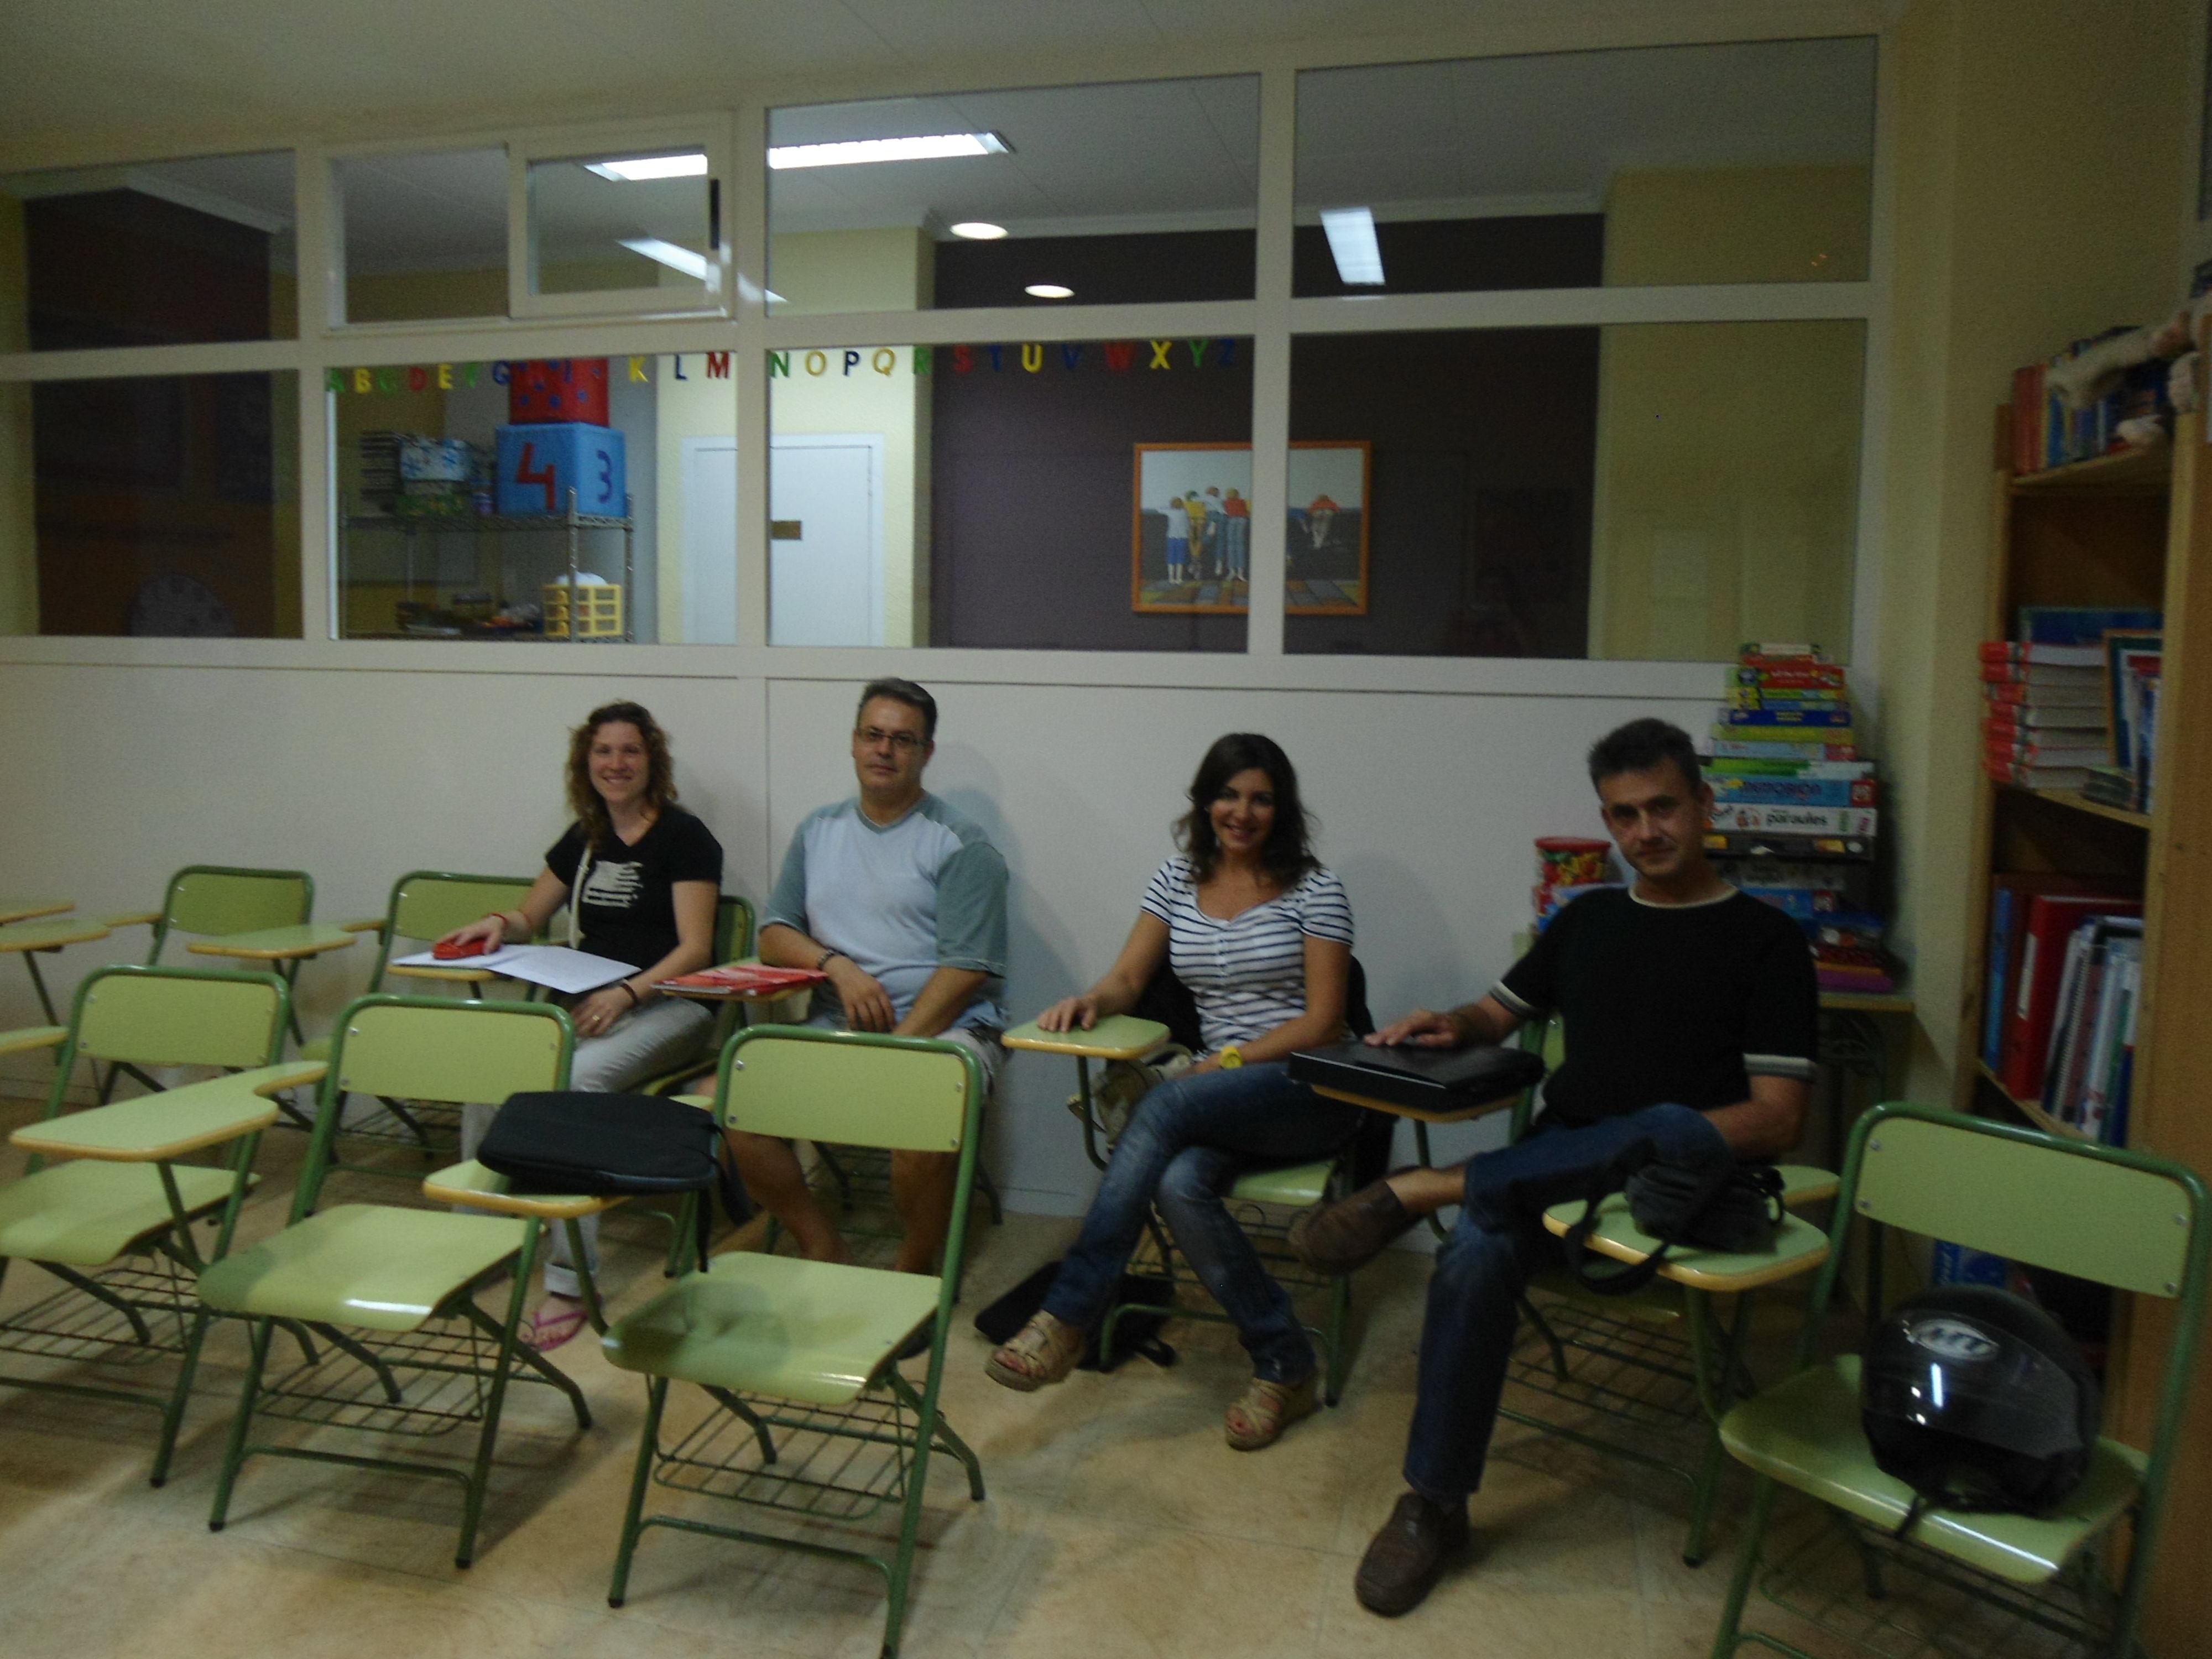 Foto 40 de Academias de idiomas en Moncada | Centre d'Estudis Etnies